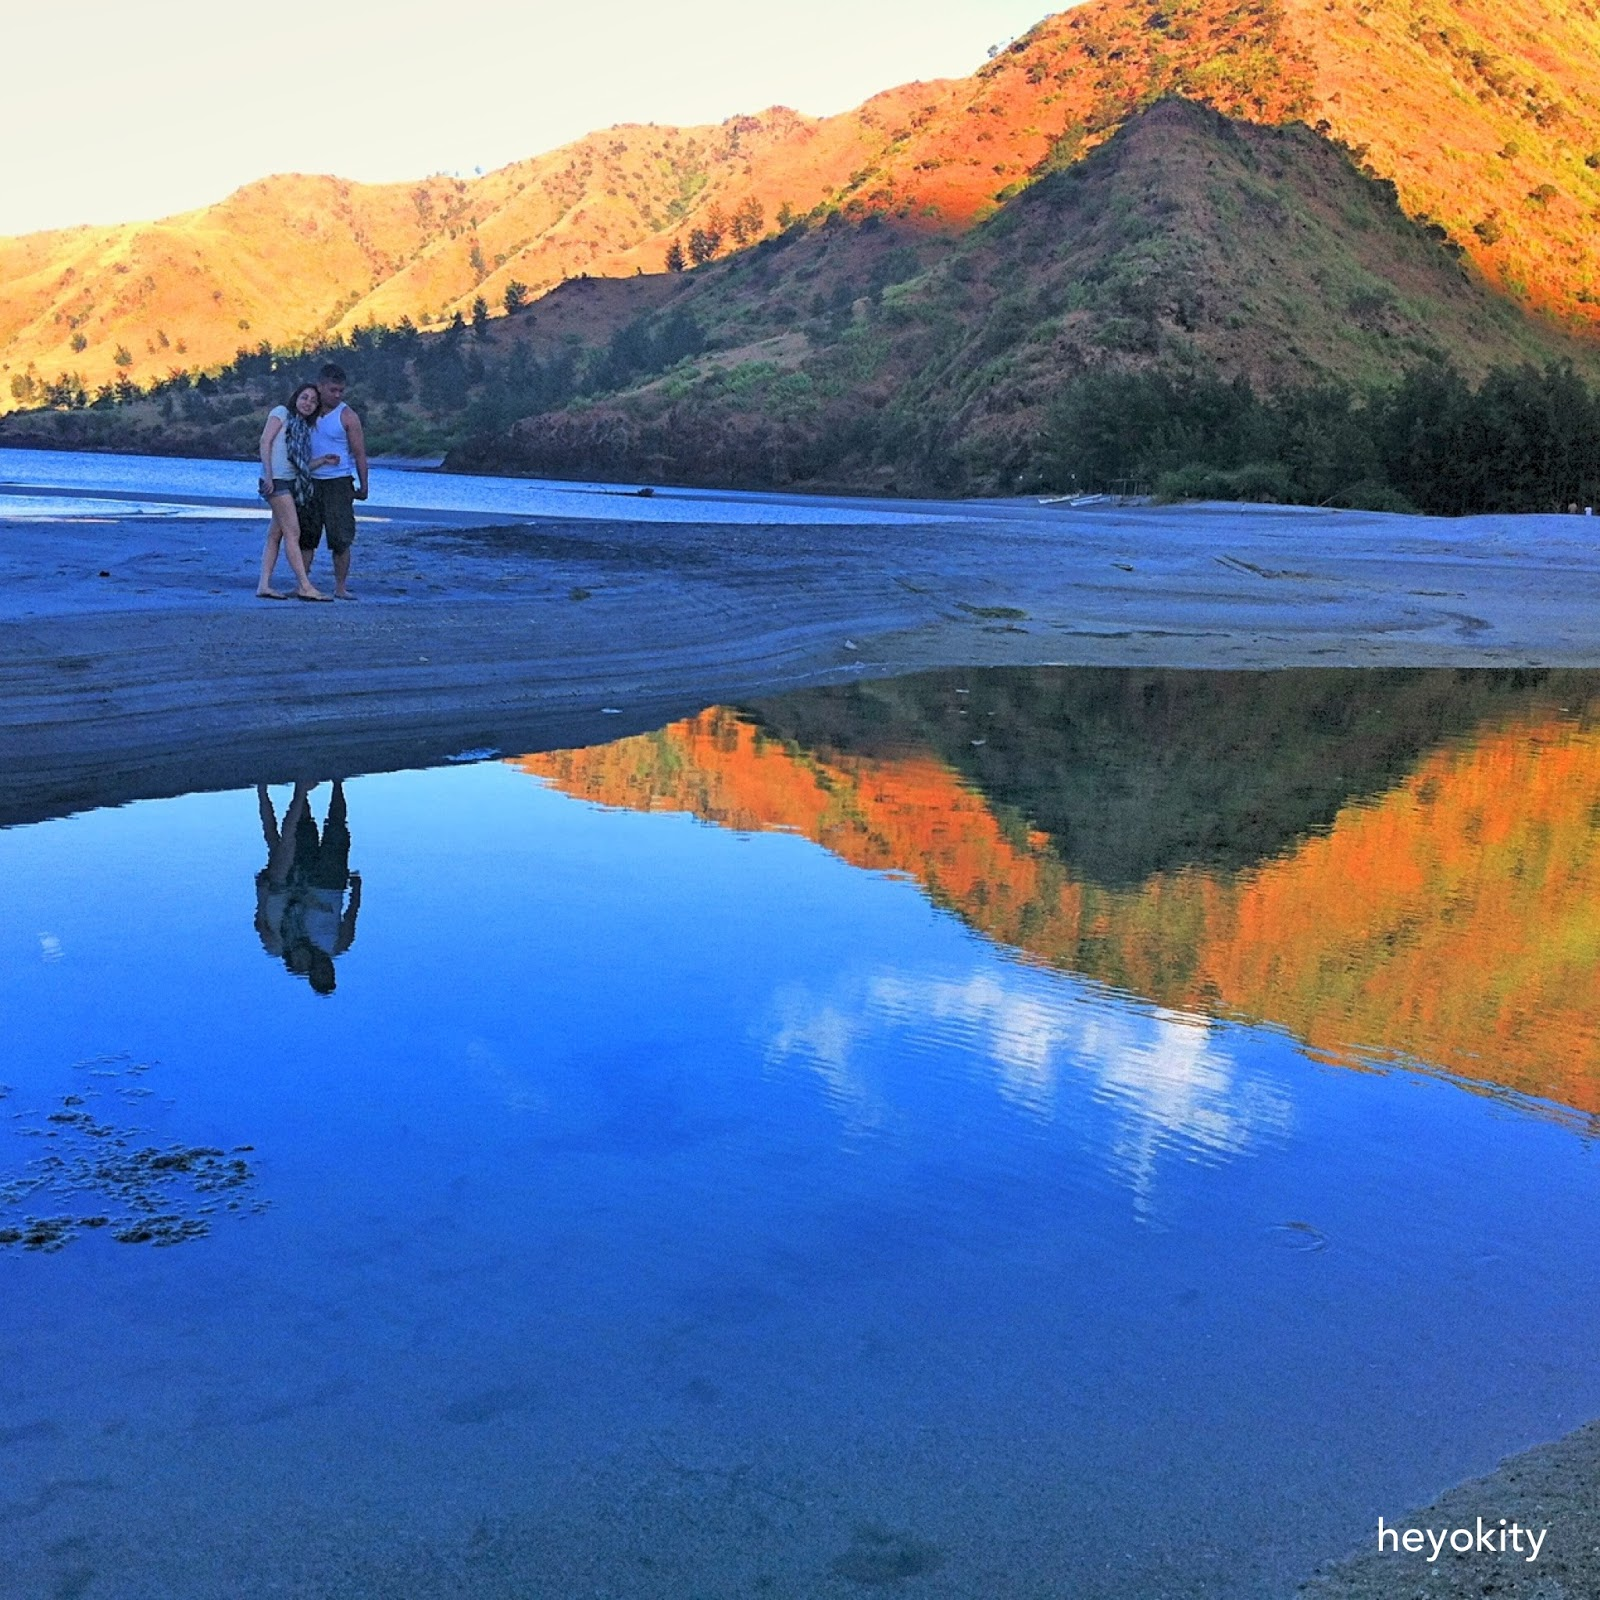 pusang maganda: TOP 13 Philippine Beach Destination